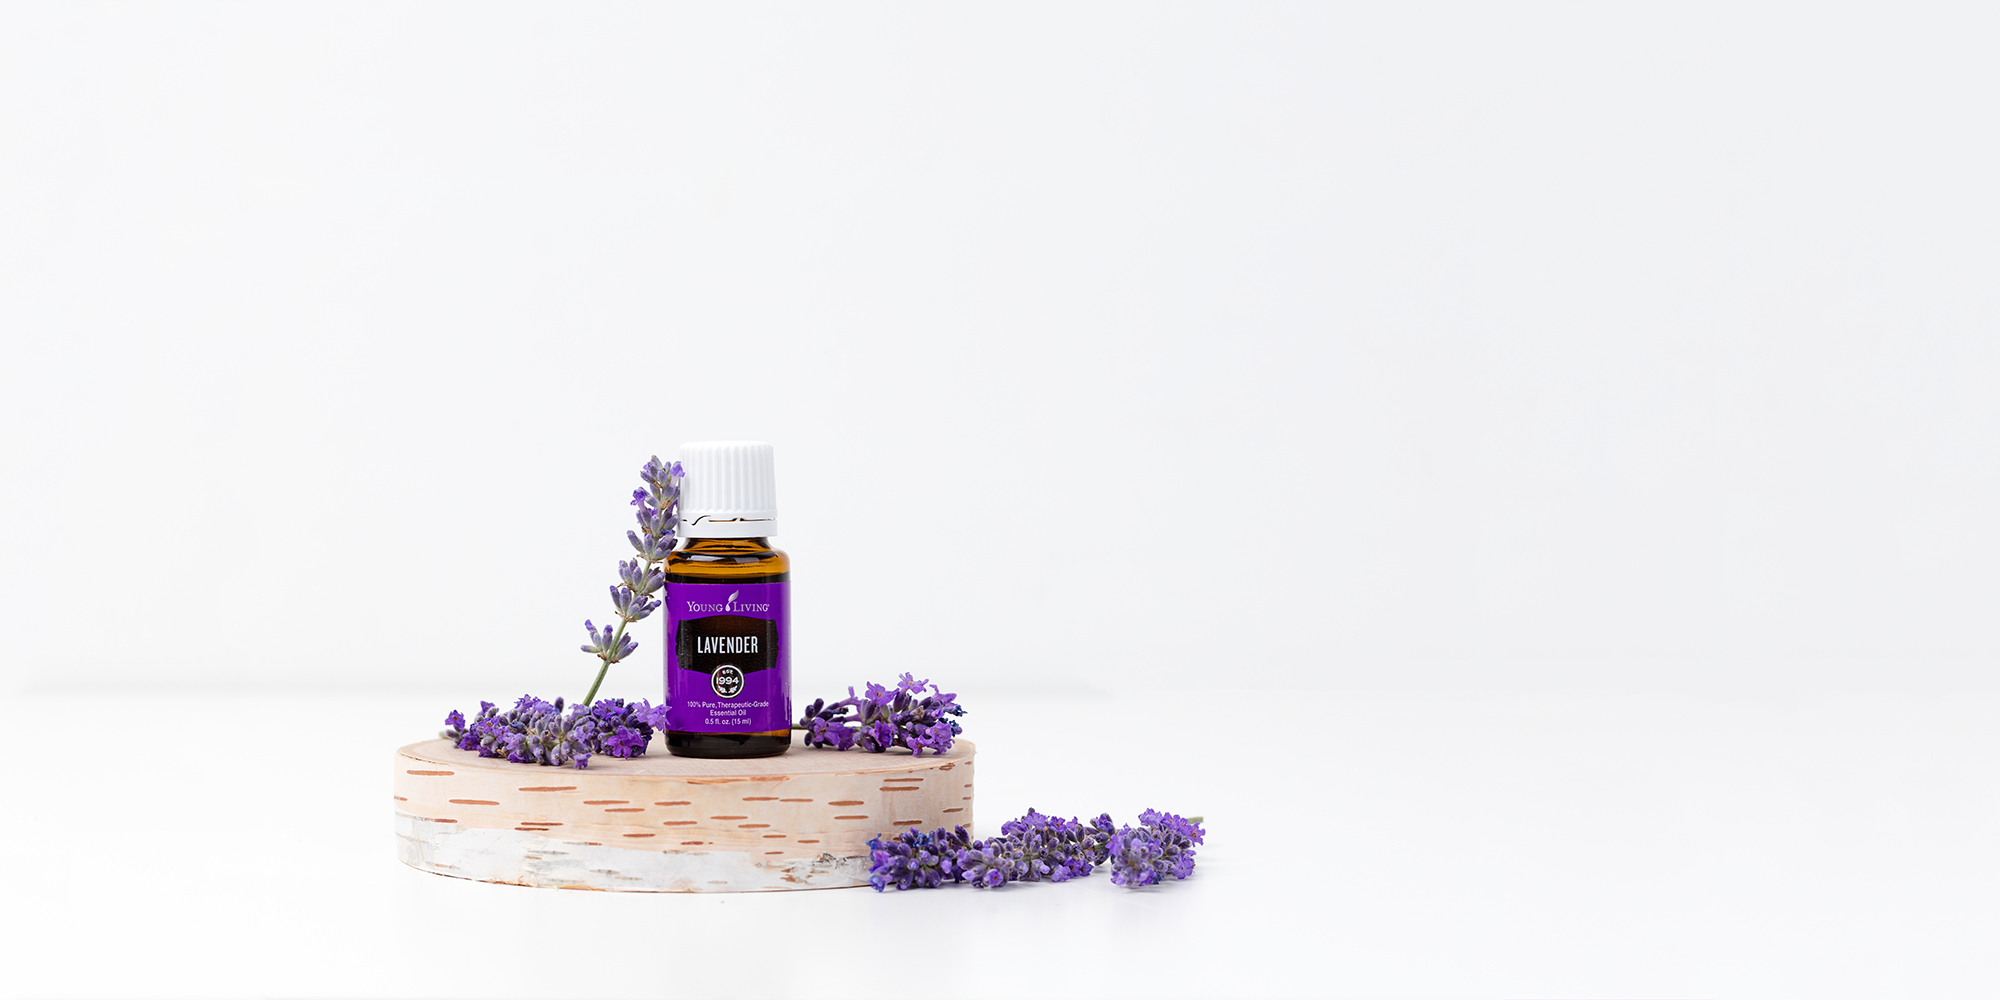 ohc_lavender_blog_header.jpg